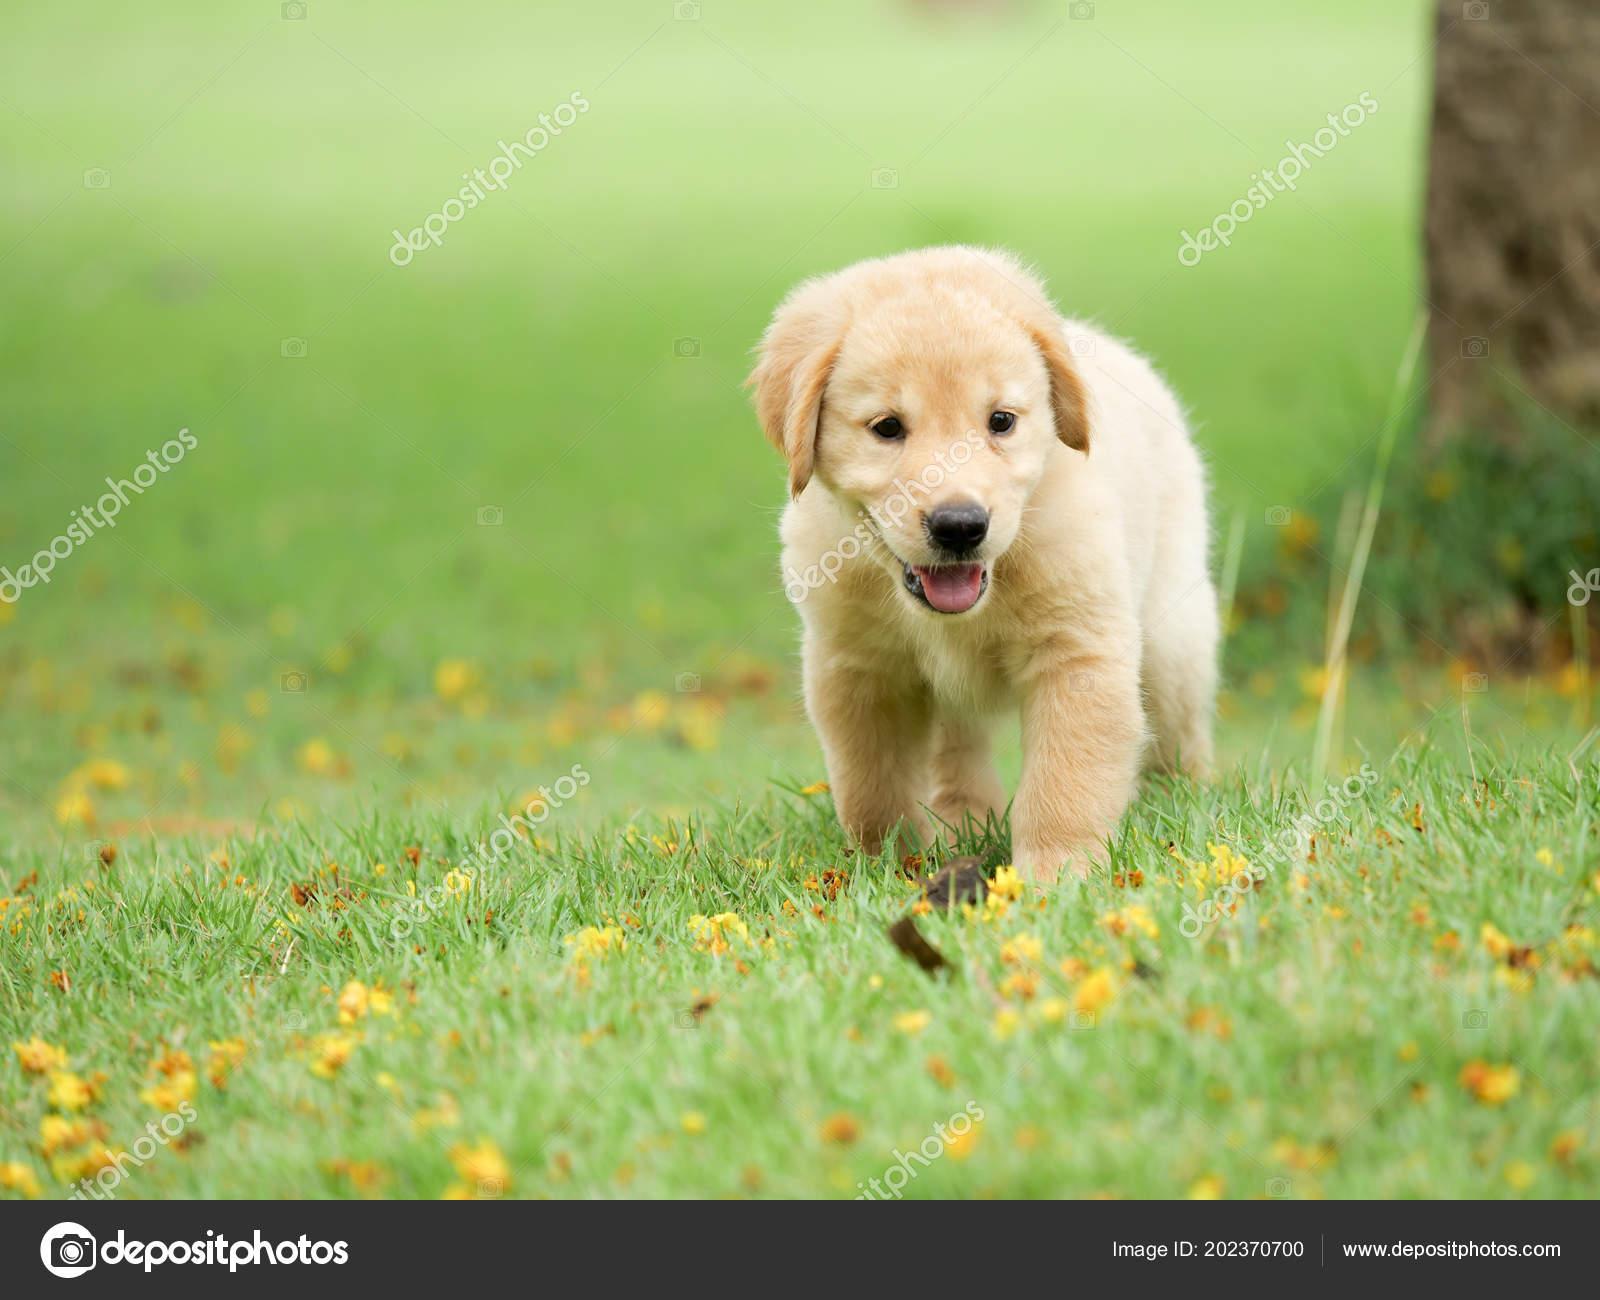 Cute Puppy Golden Retriever Running Park Stock Photo C Chayathon 202370700